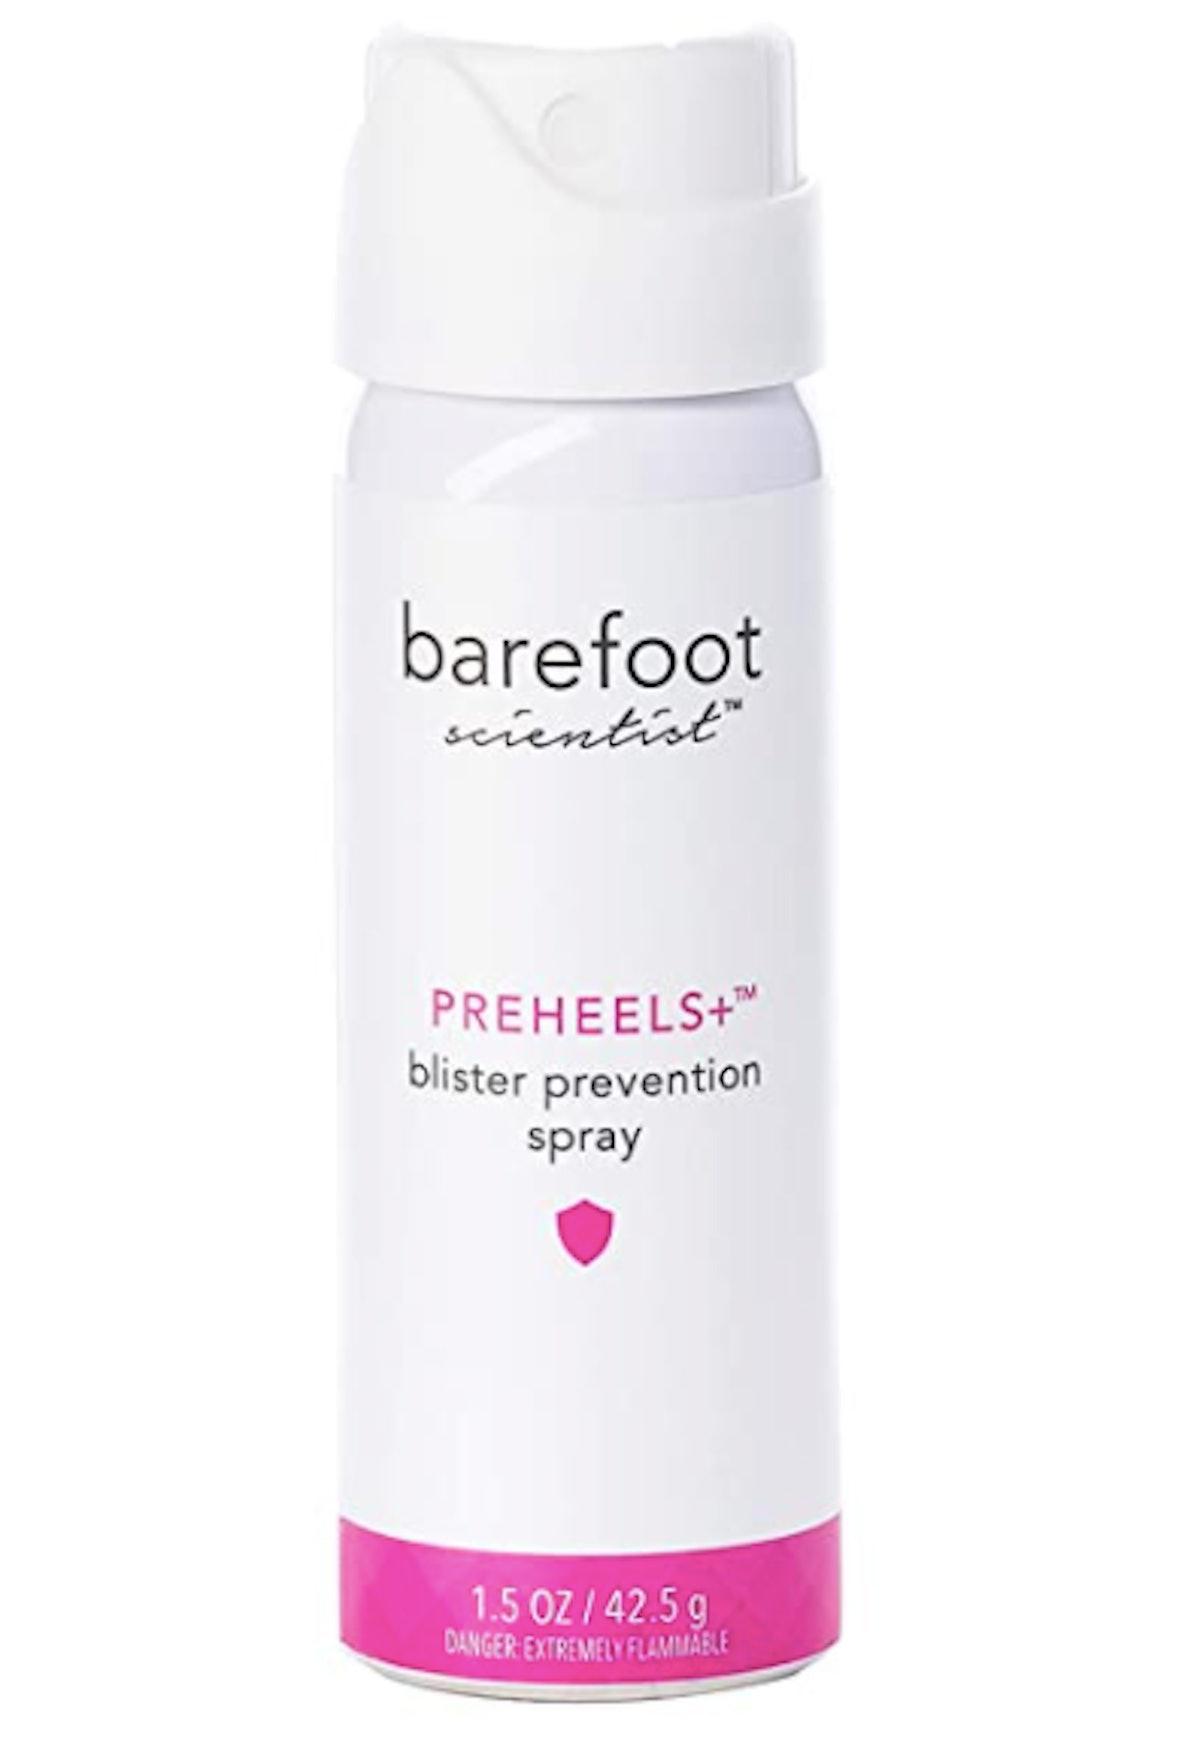 Barefoot Scientist PreHeels+ Blister Prevention Spray